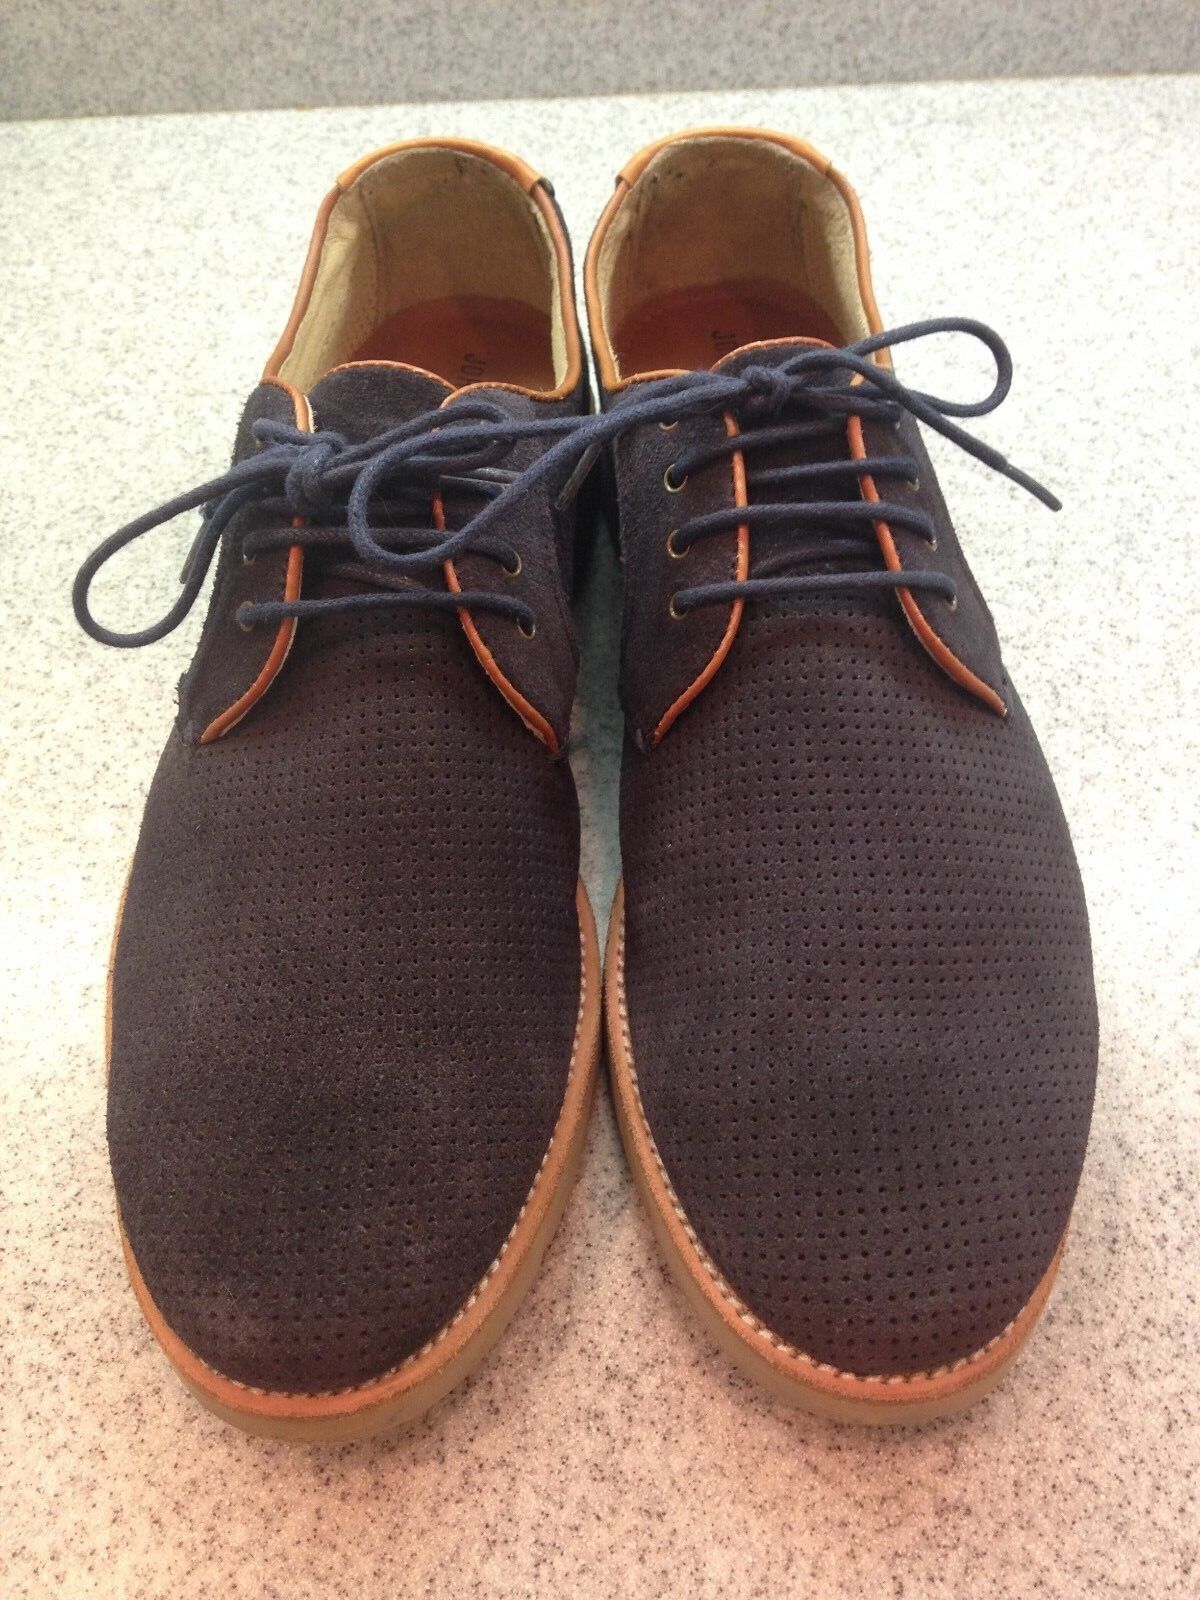 Johnston & Murphy Mens Navy bluee Suede Sheepskin Oxfords shoes Sz 8M Elvis